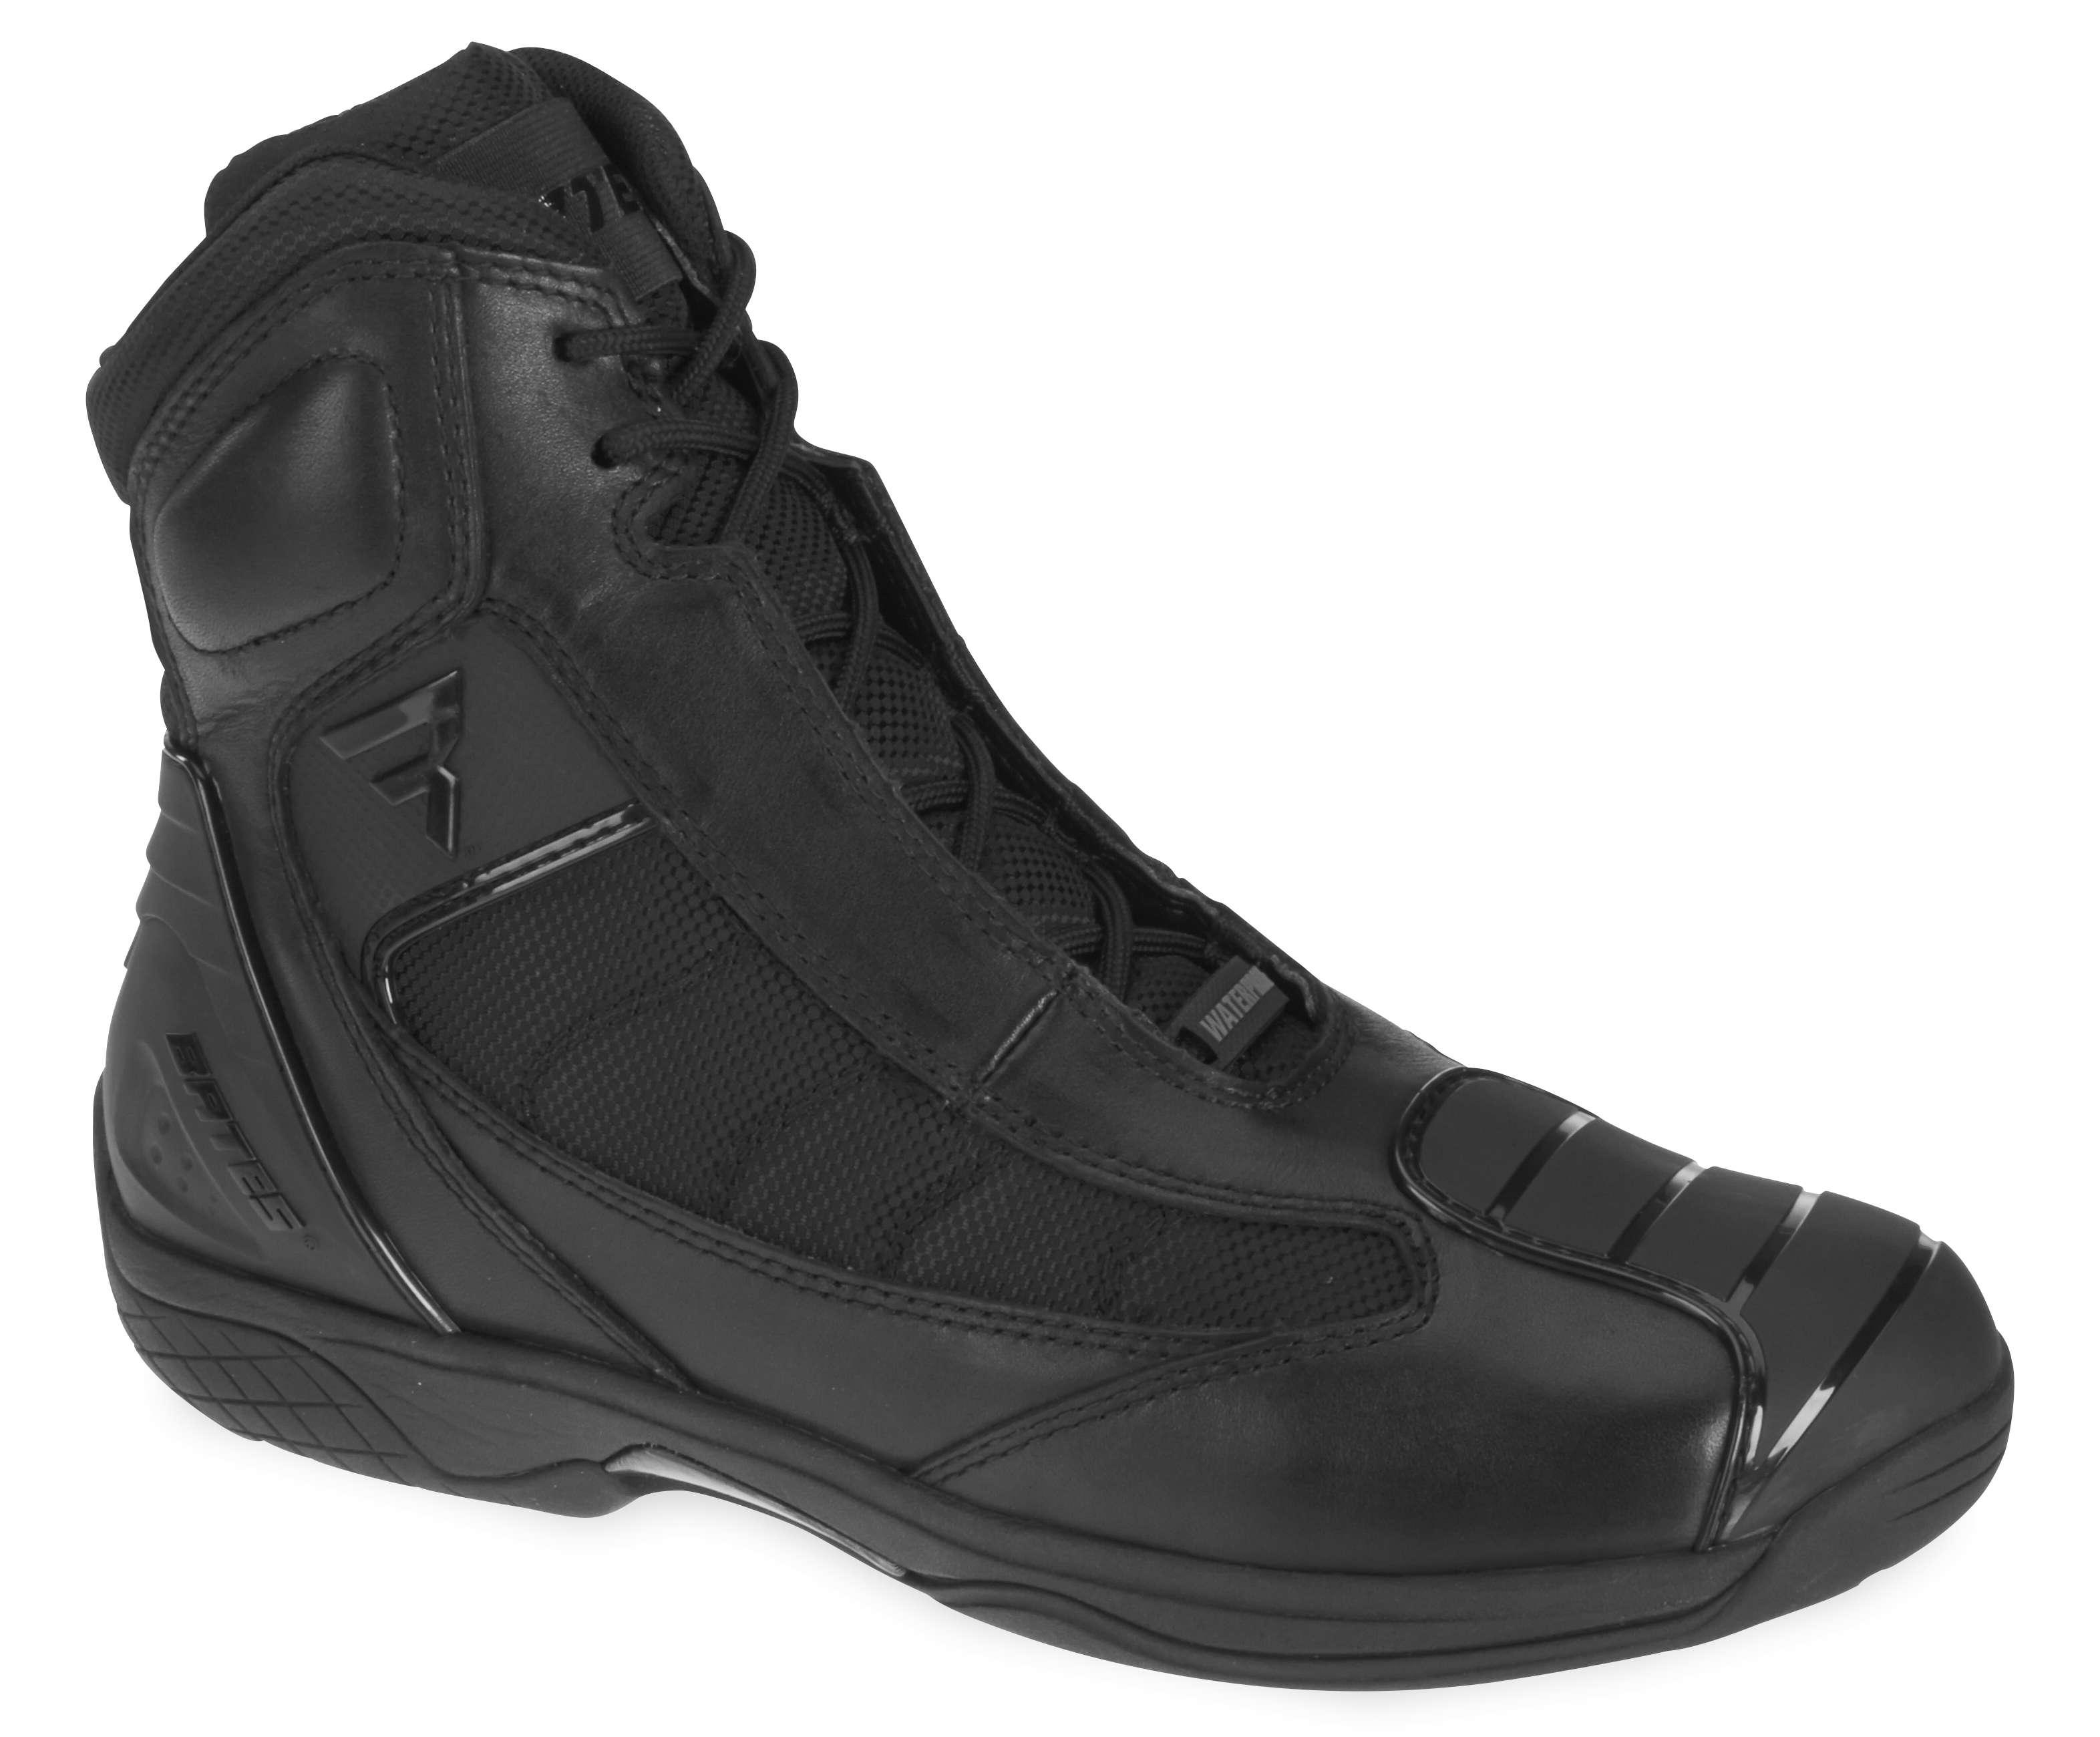 Bates Powersports Footwear Beltline Boots